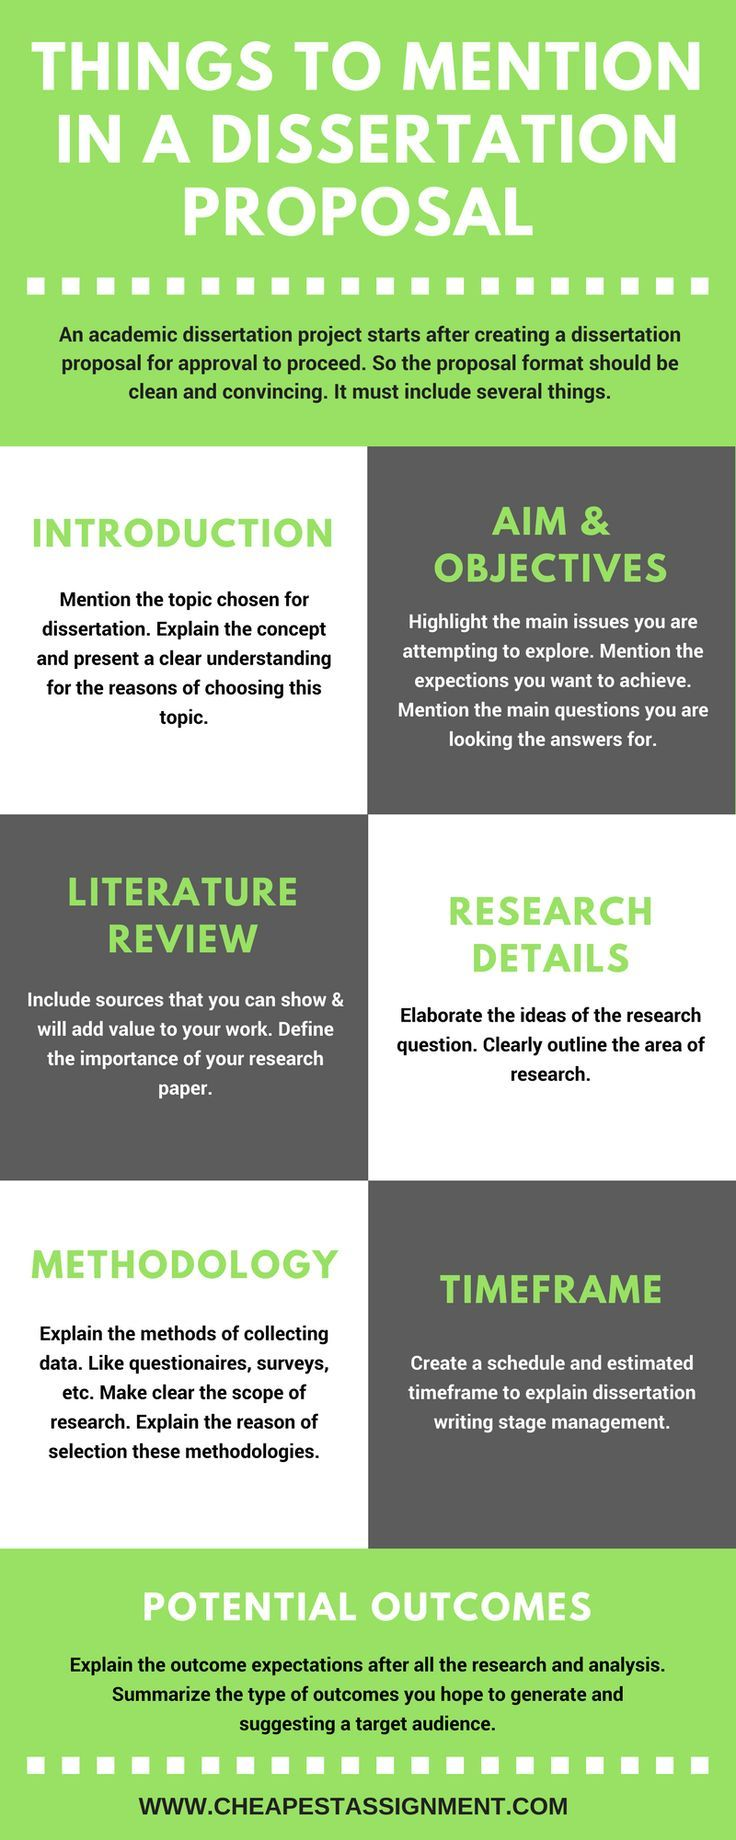 Phd thesis online australia